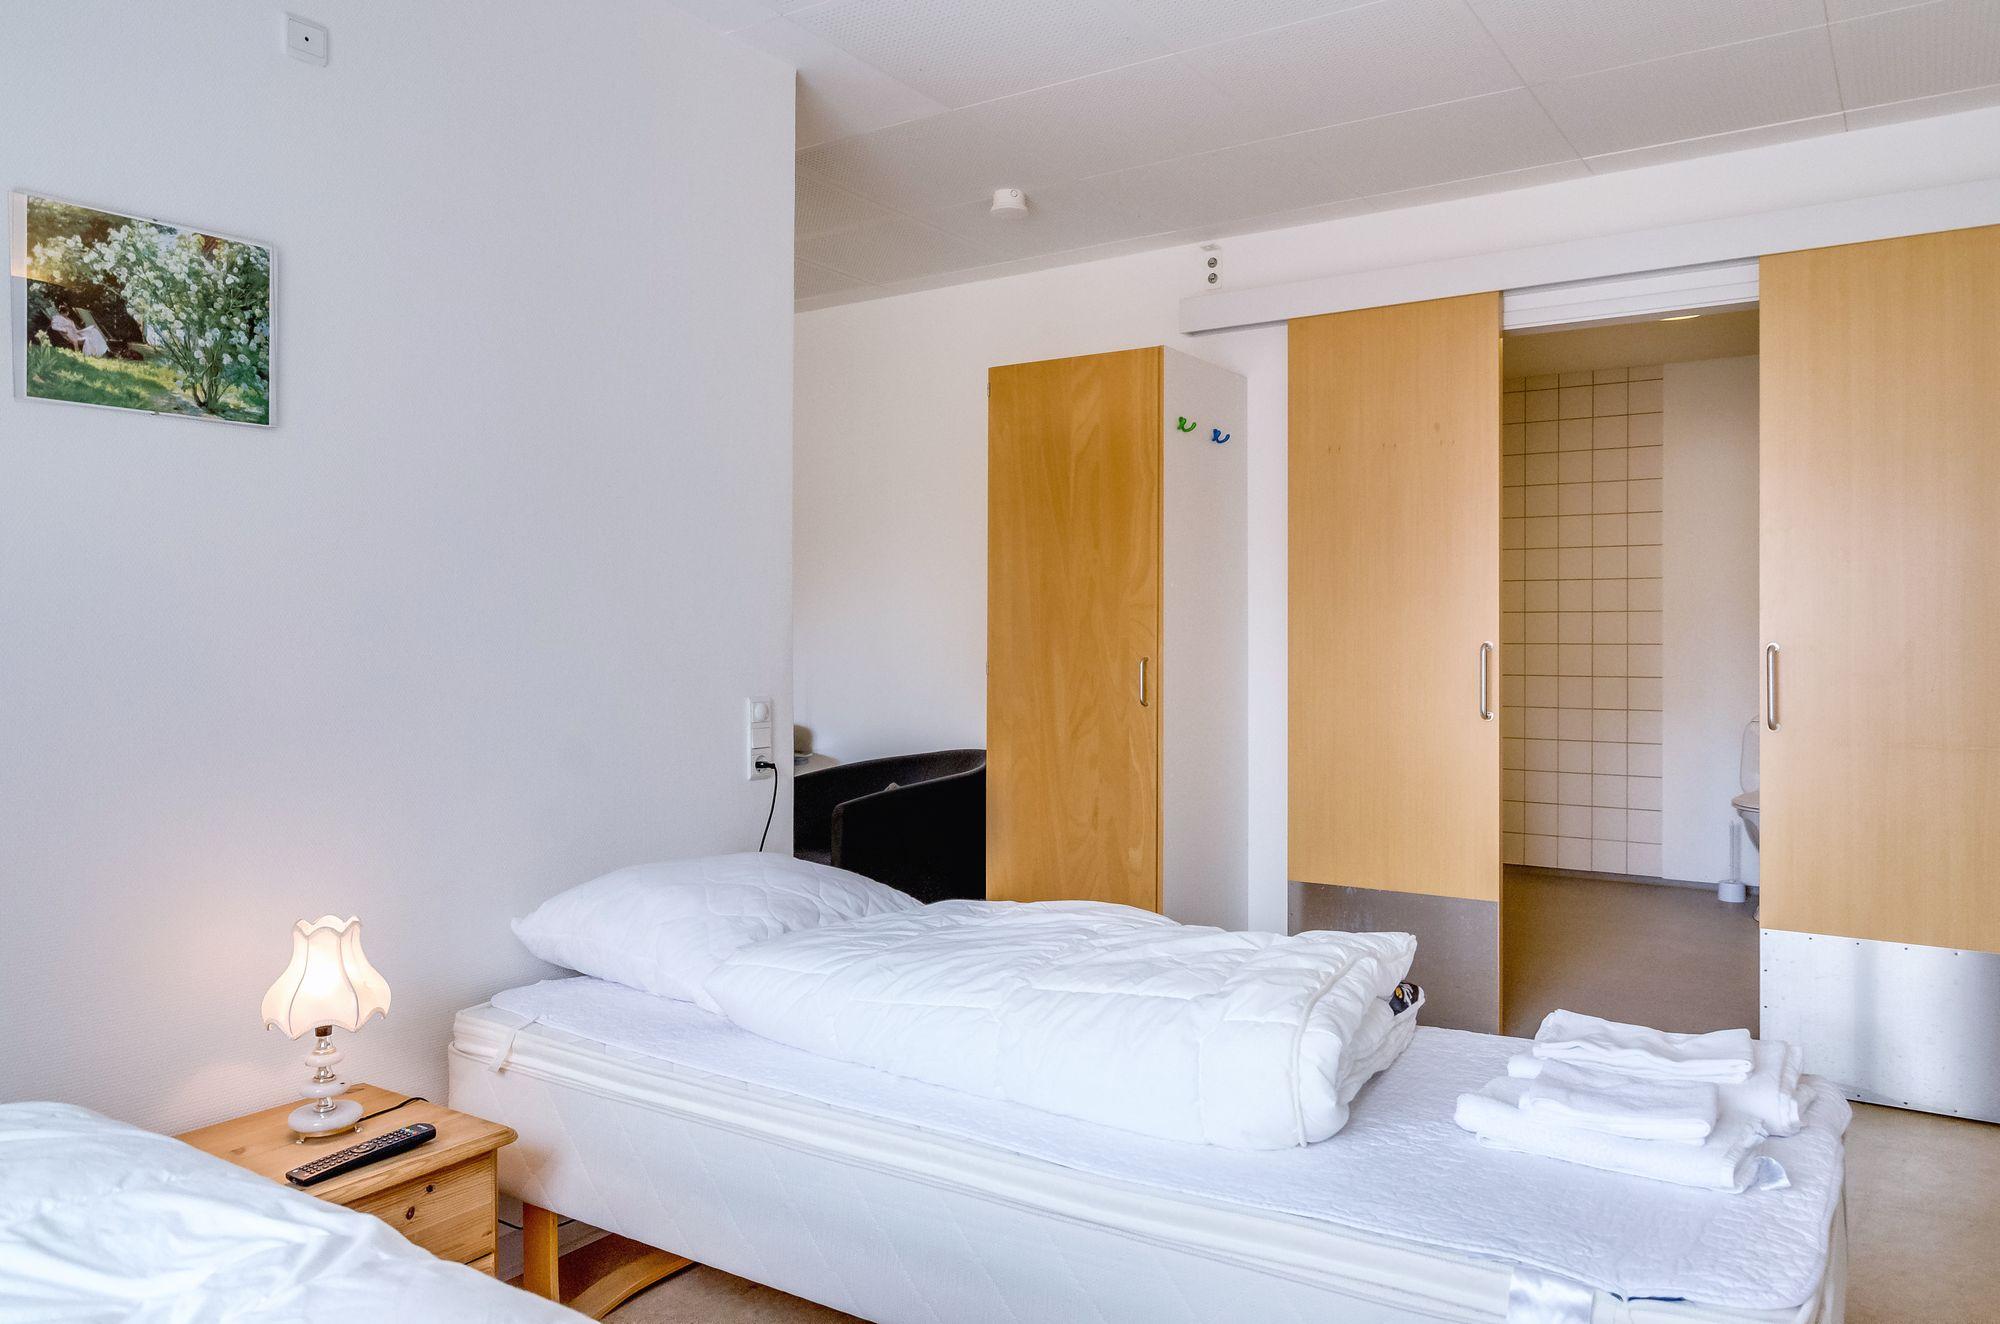 Toften B&B to senge værelse